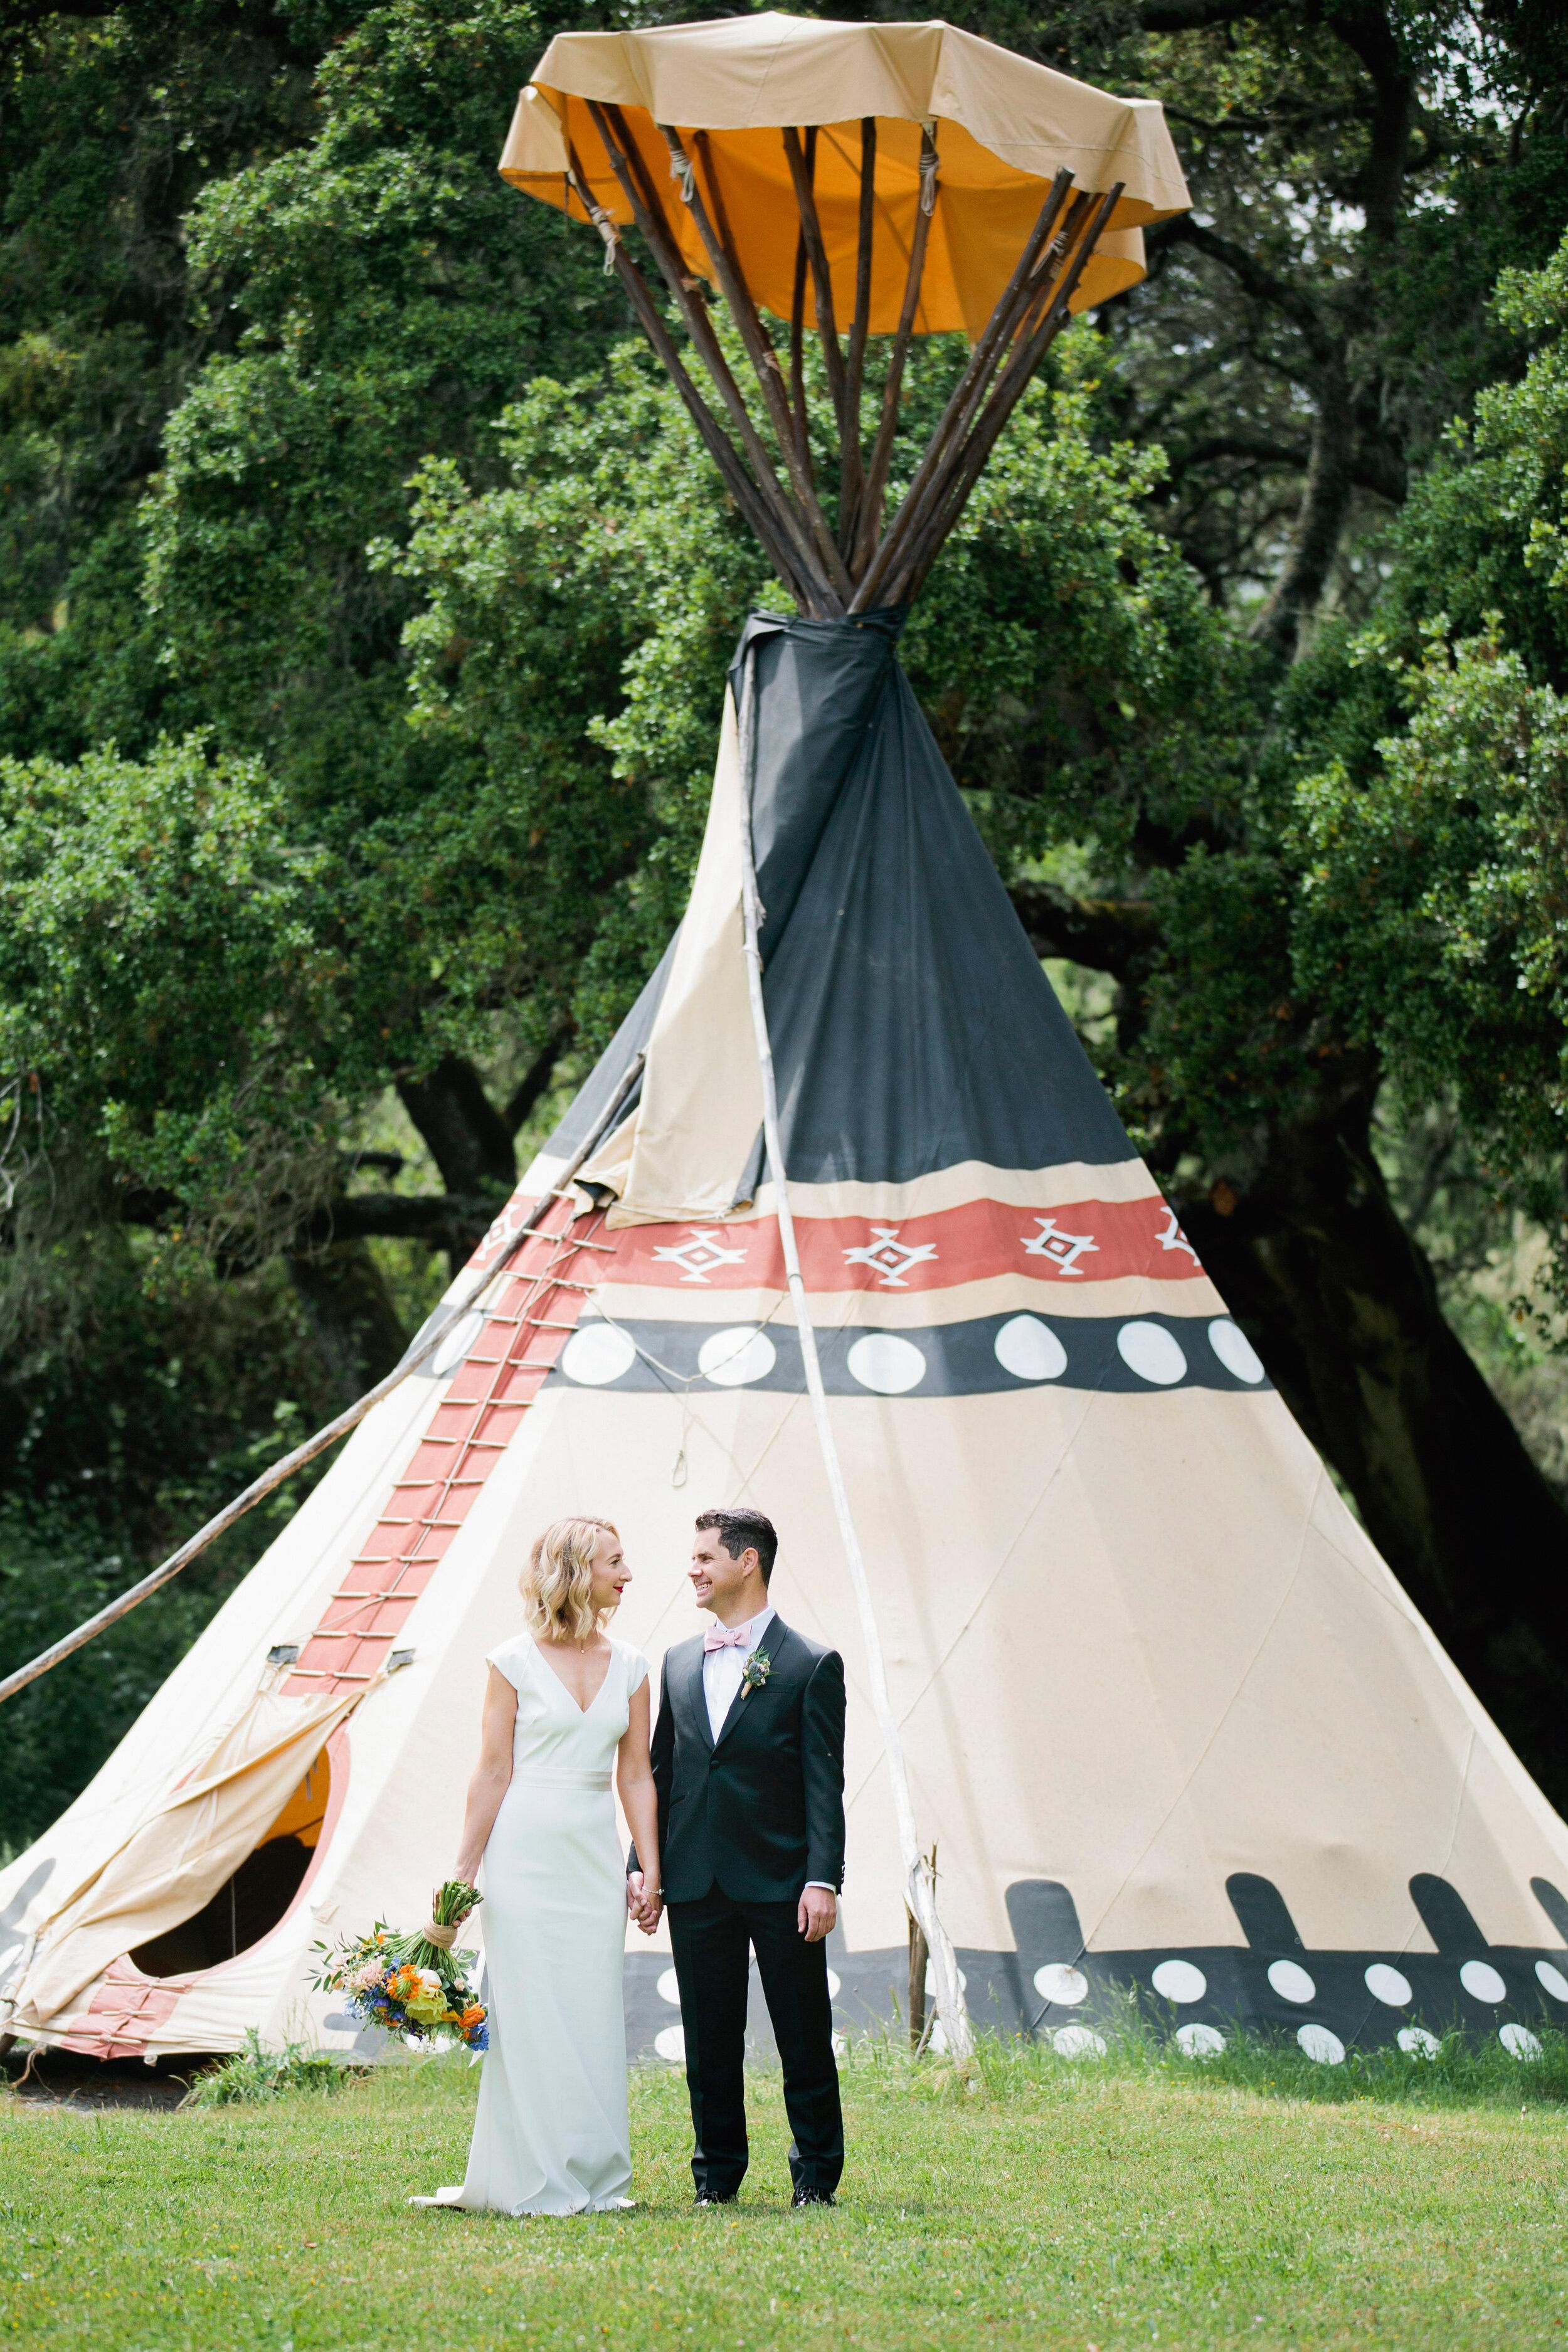 OVY-Camp-Wedding-25.JPG